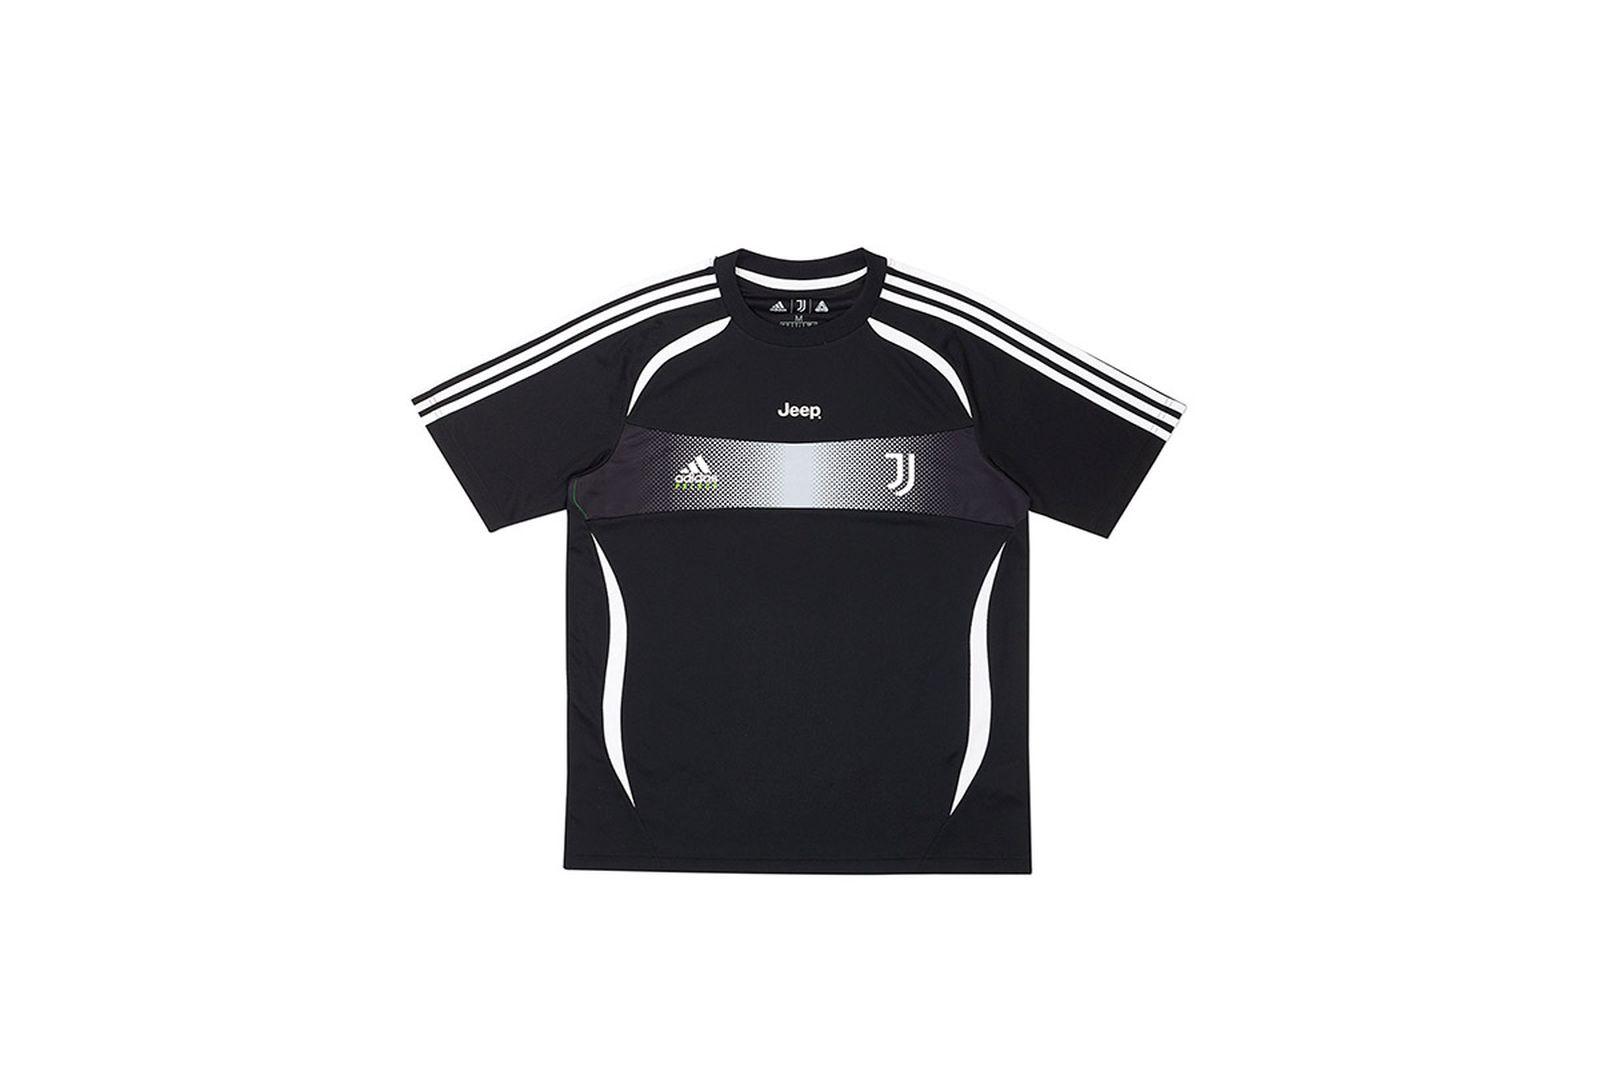 Palace-2019-Adidas-Juventus-Shirt-Training-black--19602